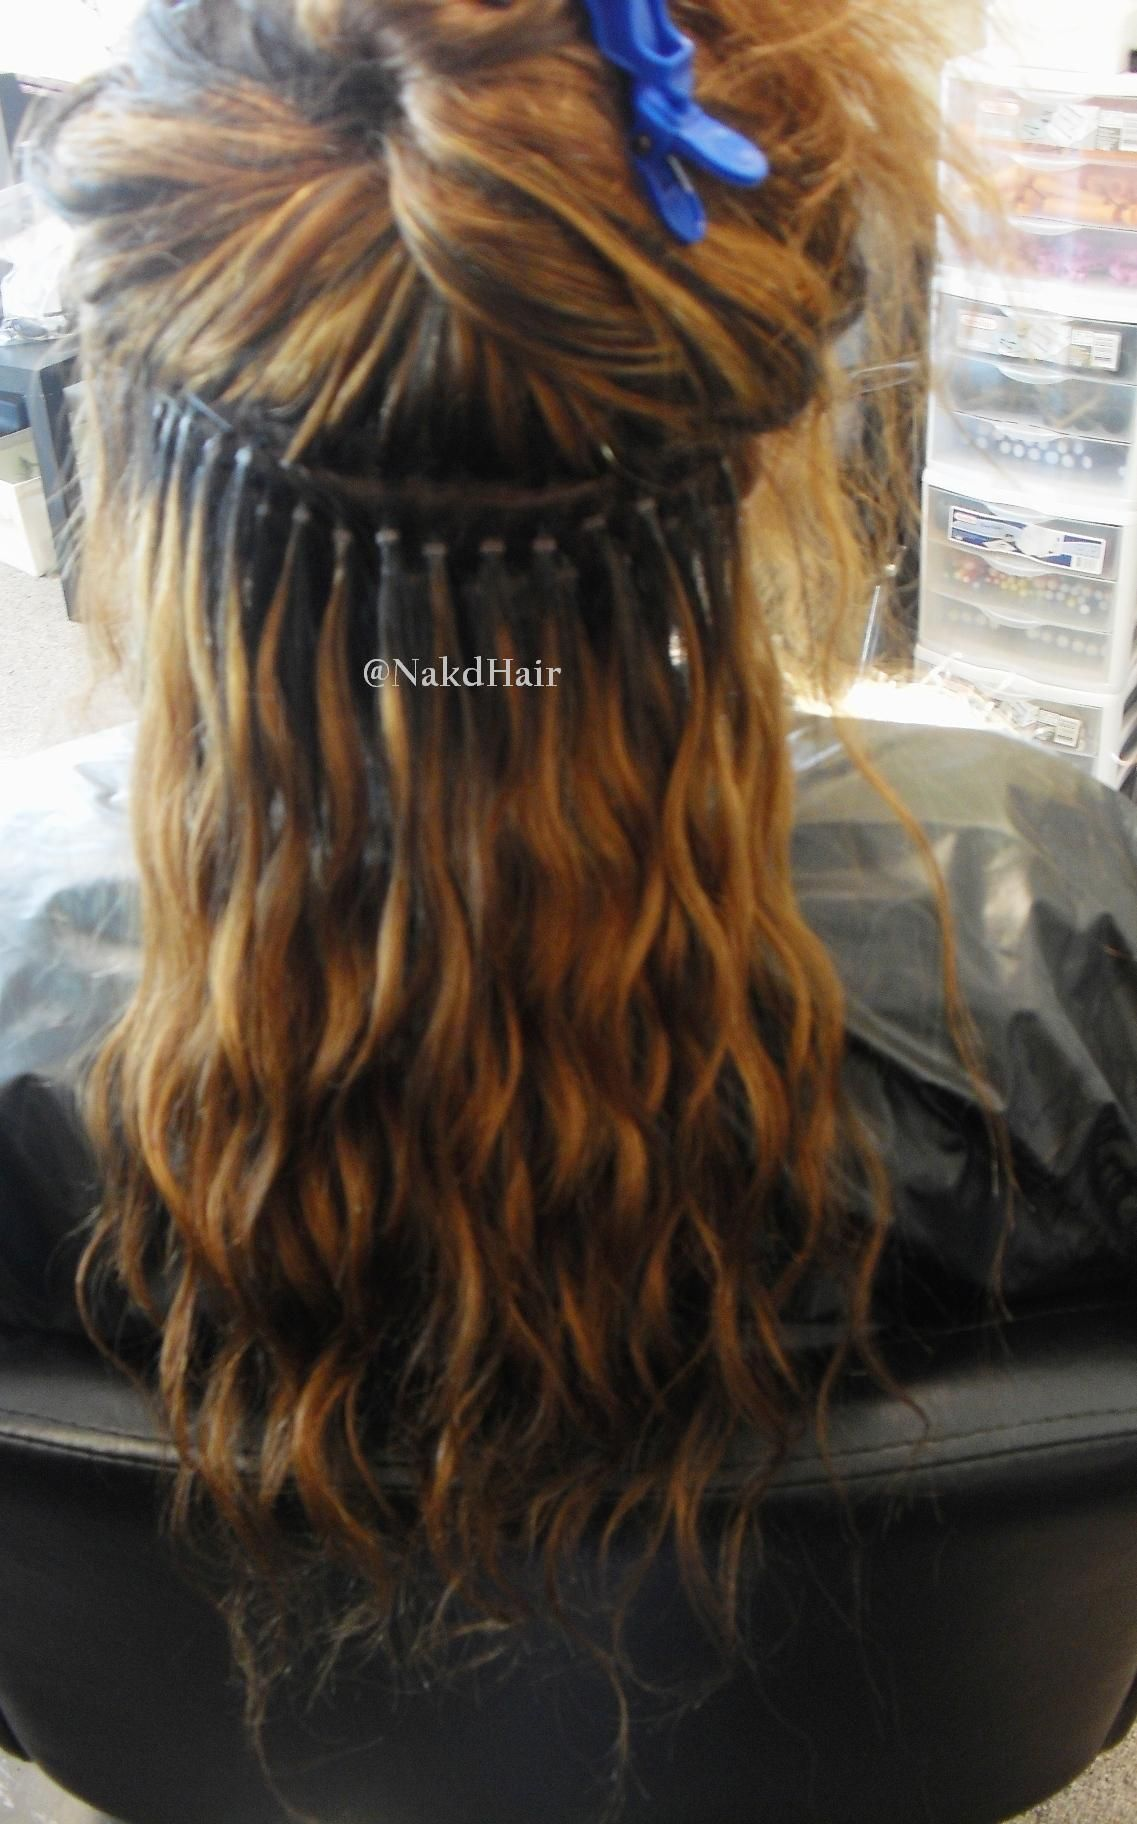 Mcdonough Virgin Indian Hair Weaves Nakd Hair Before Cold Fusion 14